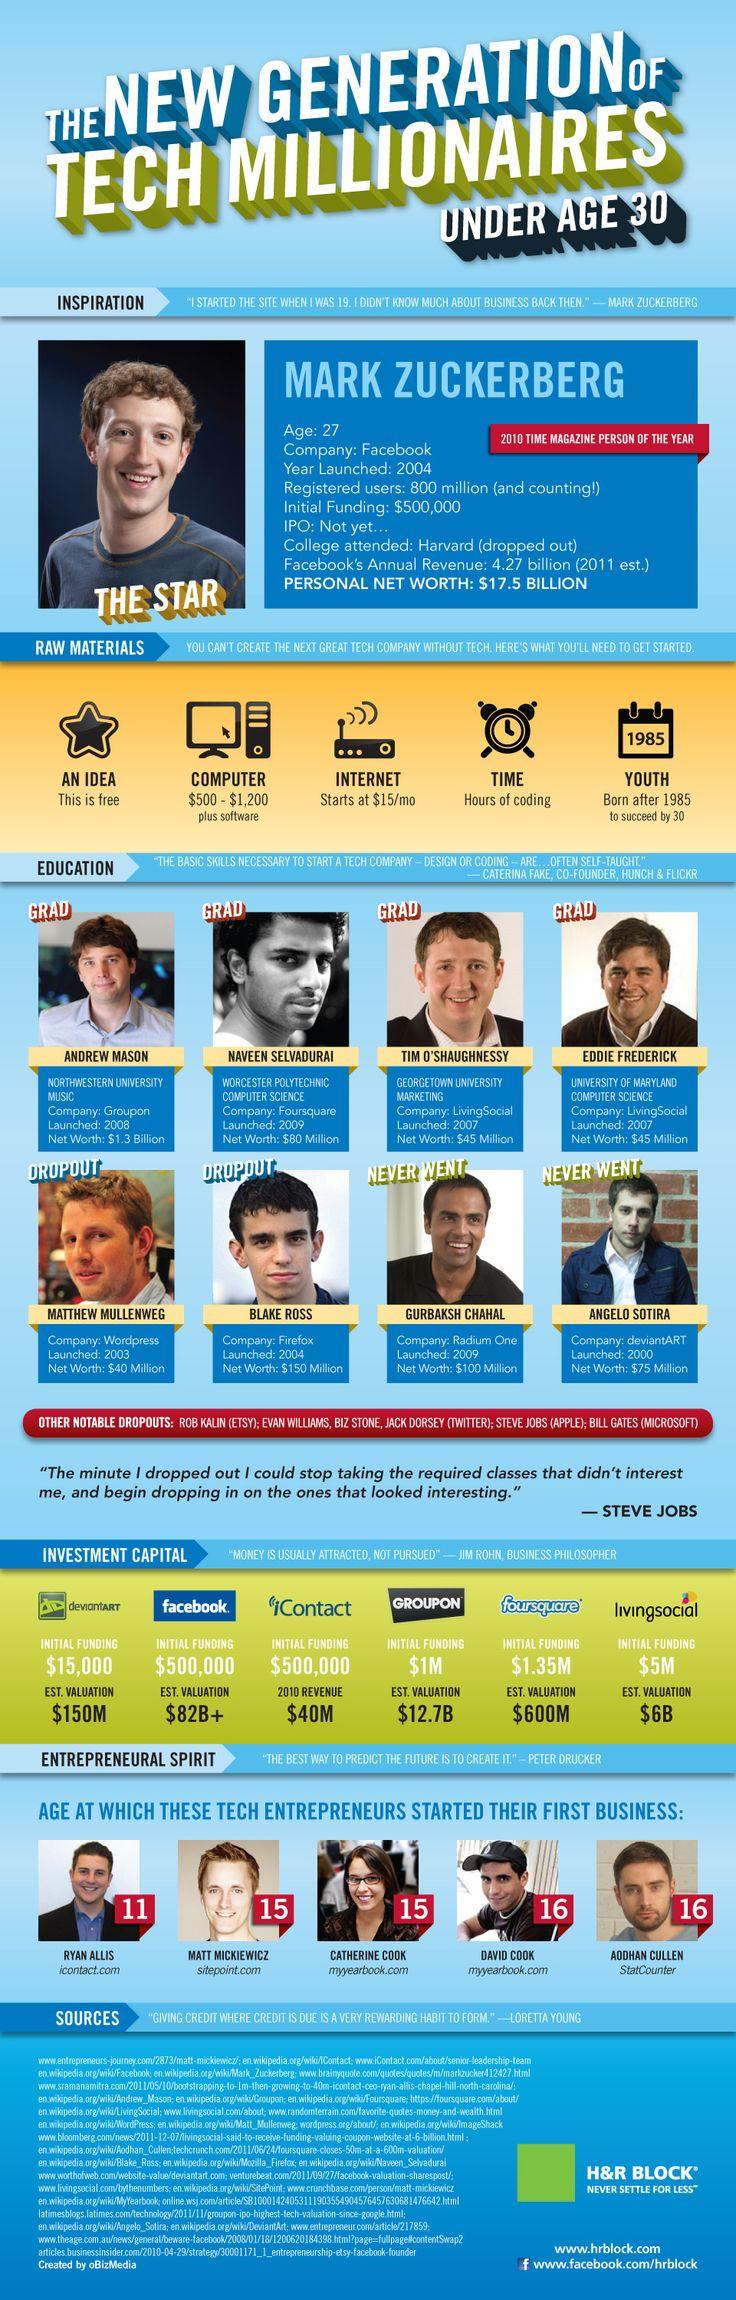 9 Tech Millionaires Under Age 30 [INFOGRAPHIC]